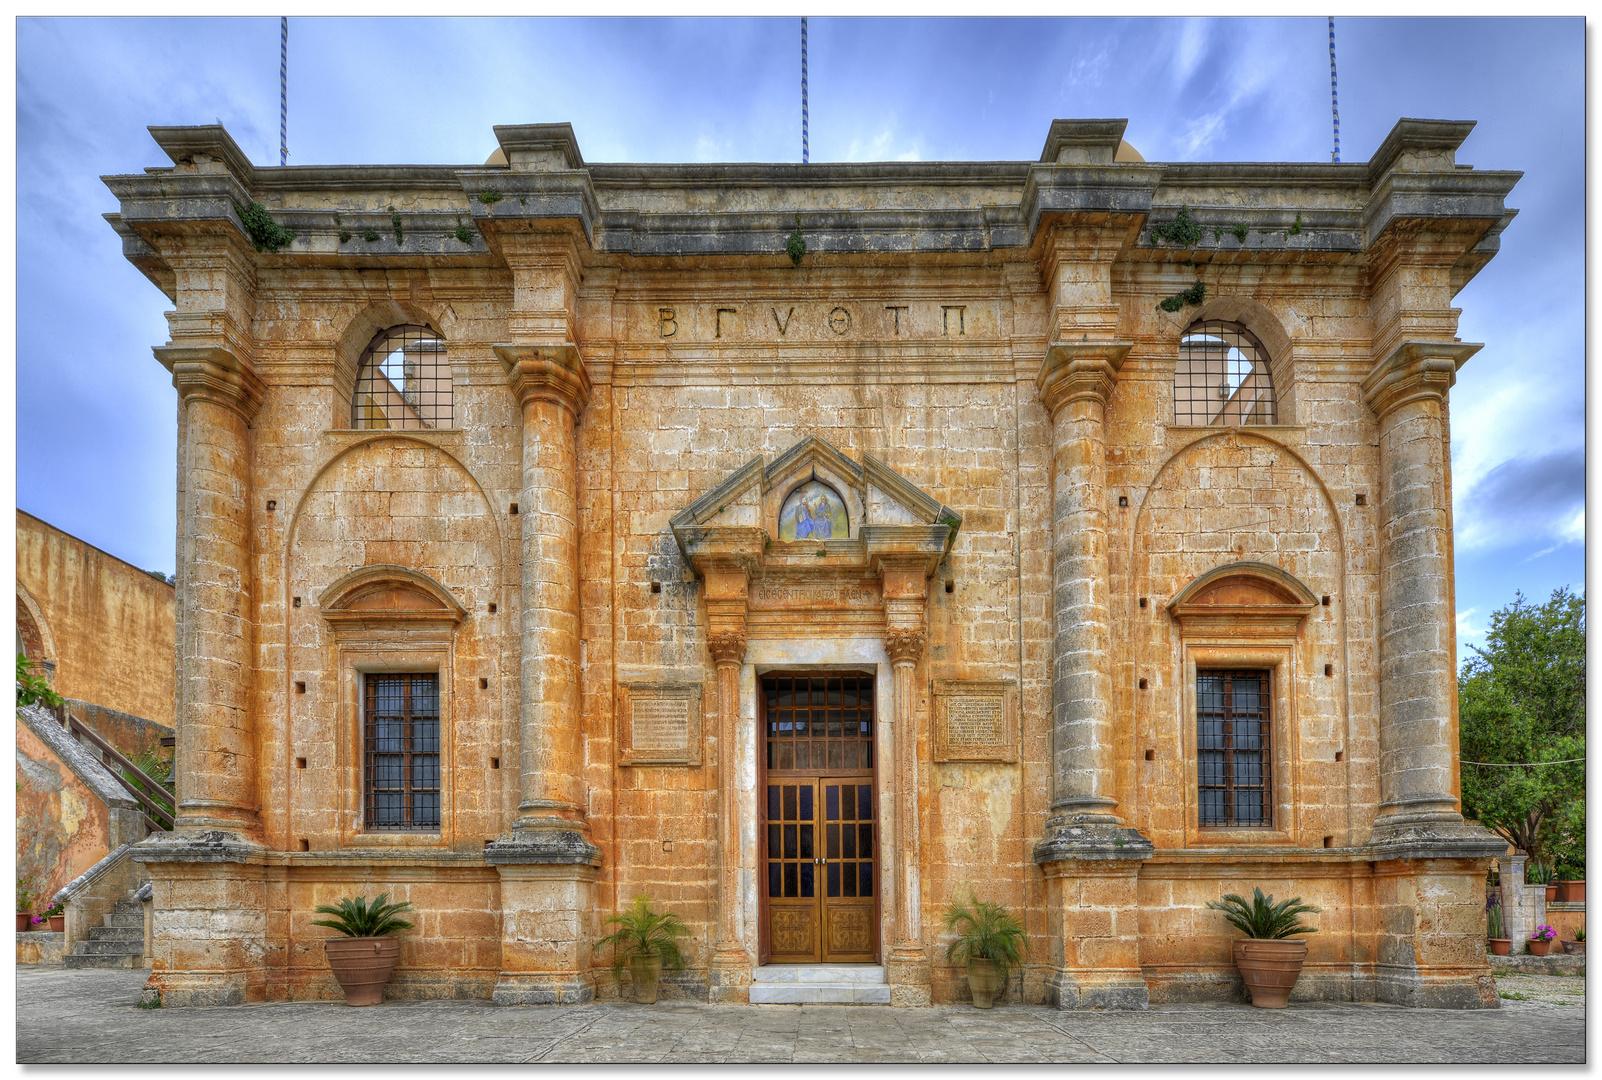 Agia Triada-Kloster Kirche